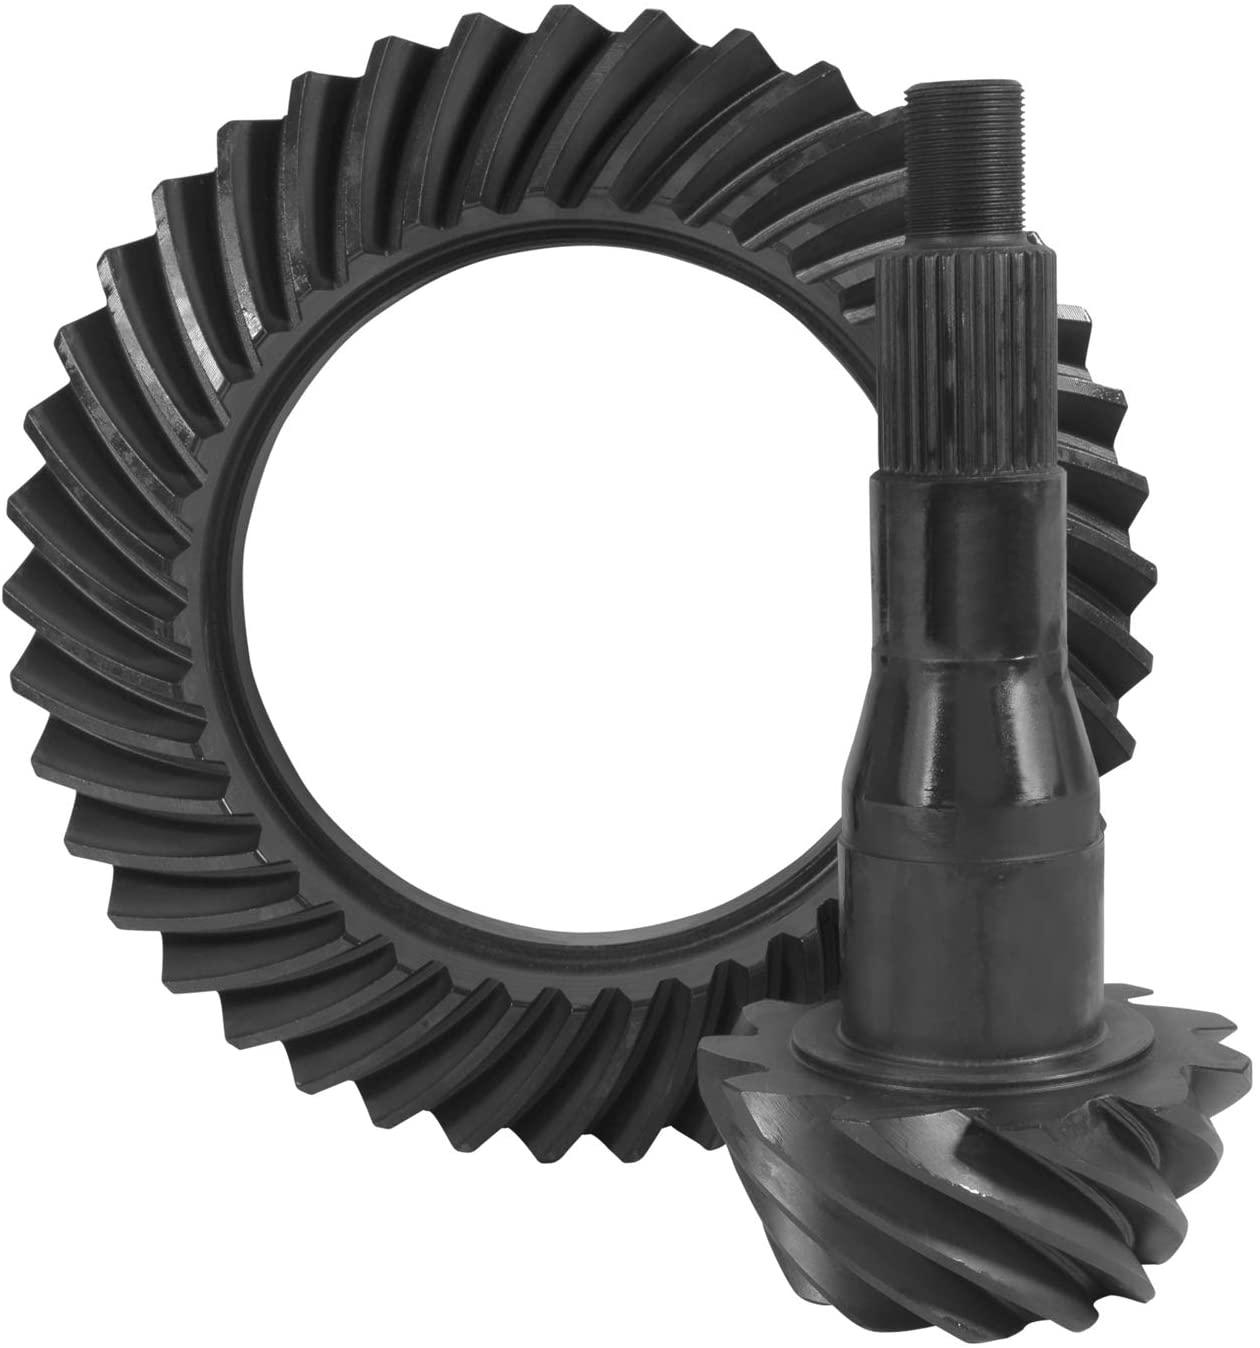 Yukon Gear & Axle (YG F9.75-373-11) High Performance Ring & Pinion Gear Set for Ford 9.75 Differential